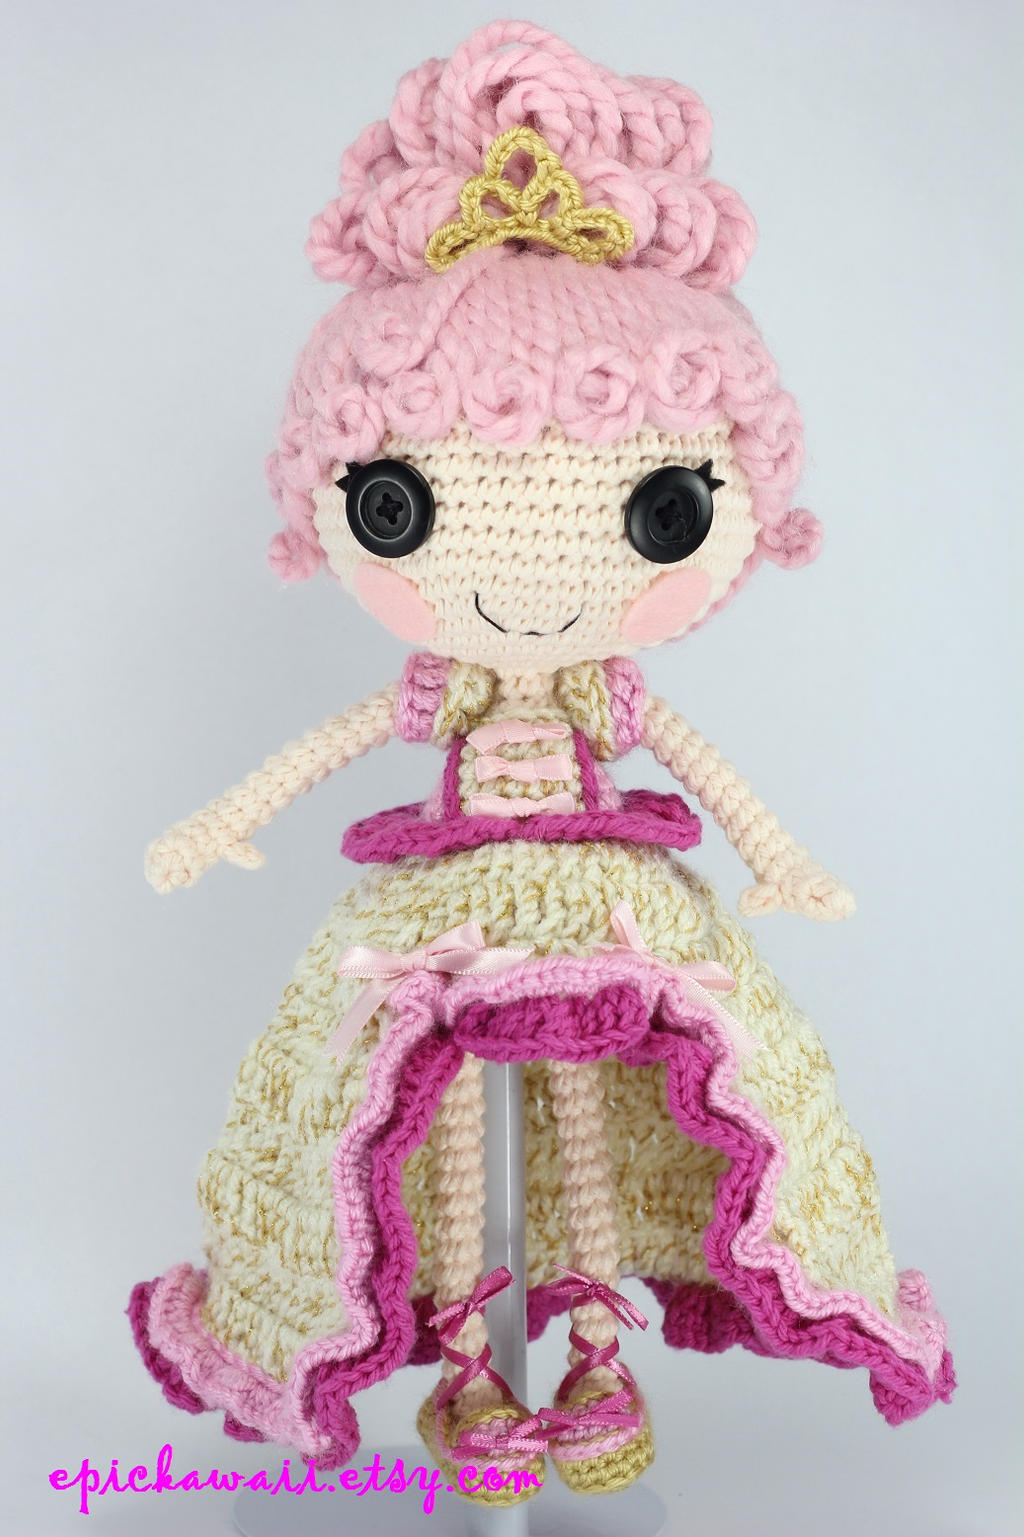 Amigurumi Hair Patterns : LALALOOPSY Goldie Luxe Crochet Amigurumi Doll by Npantz22 ...